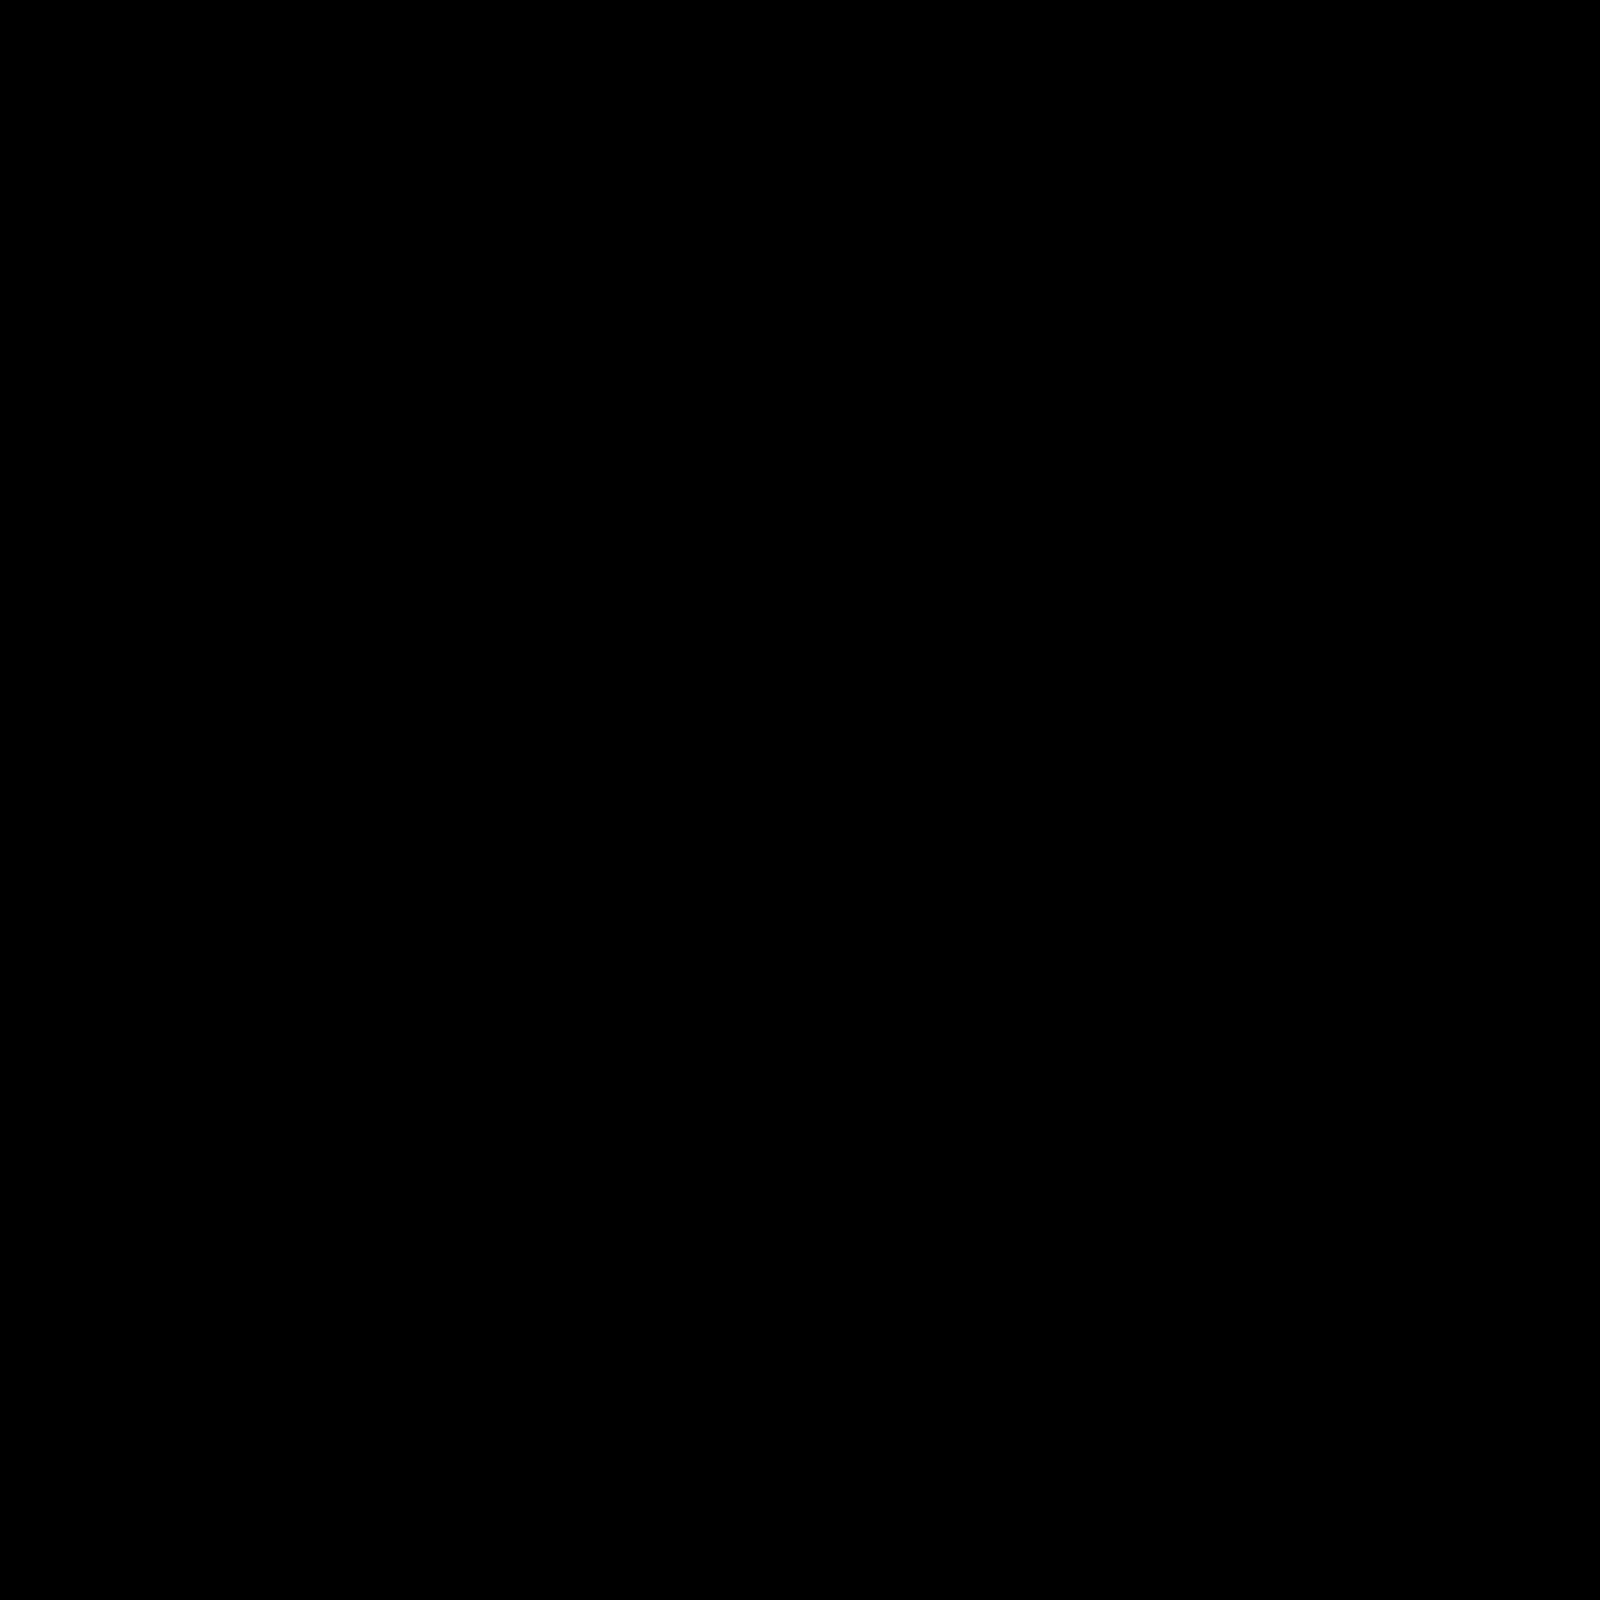 laski cynamonu icon